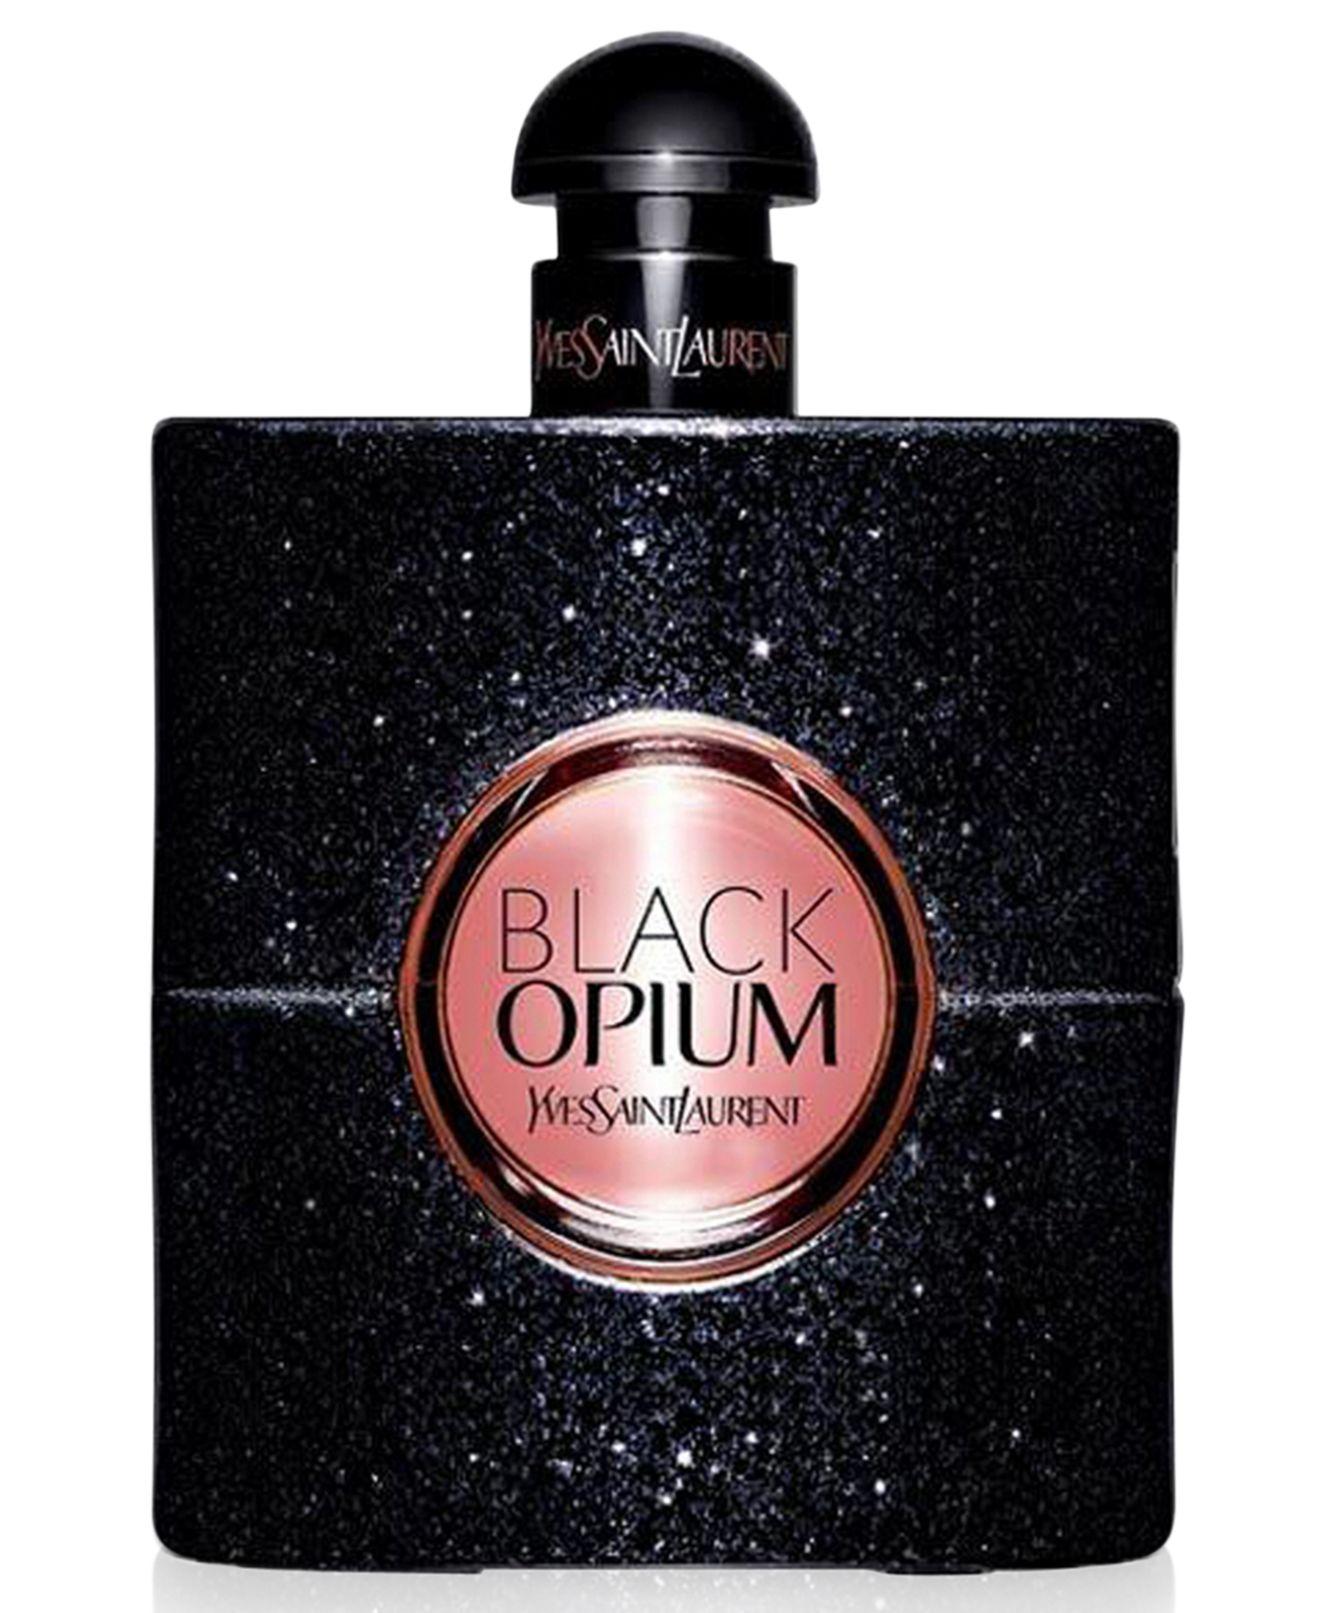 Opium Yves Saint Laurent Mujer Precio Yves Saint Laurent Black Opium